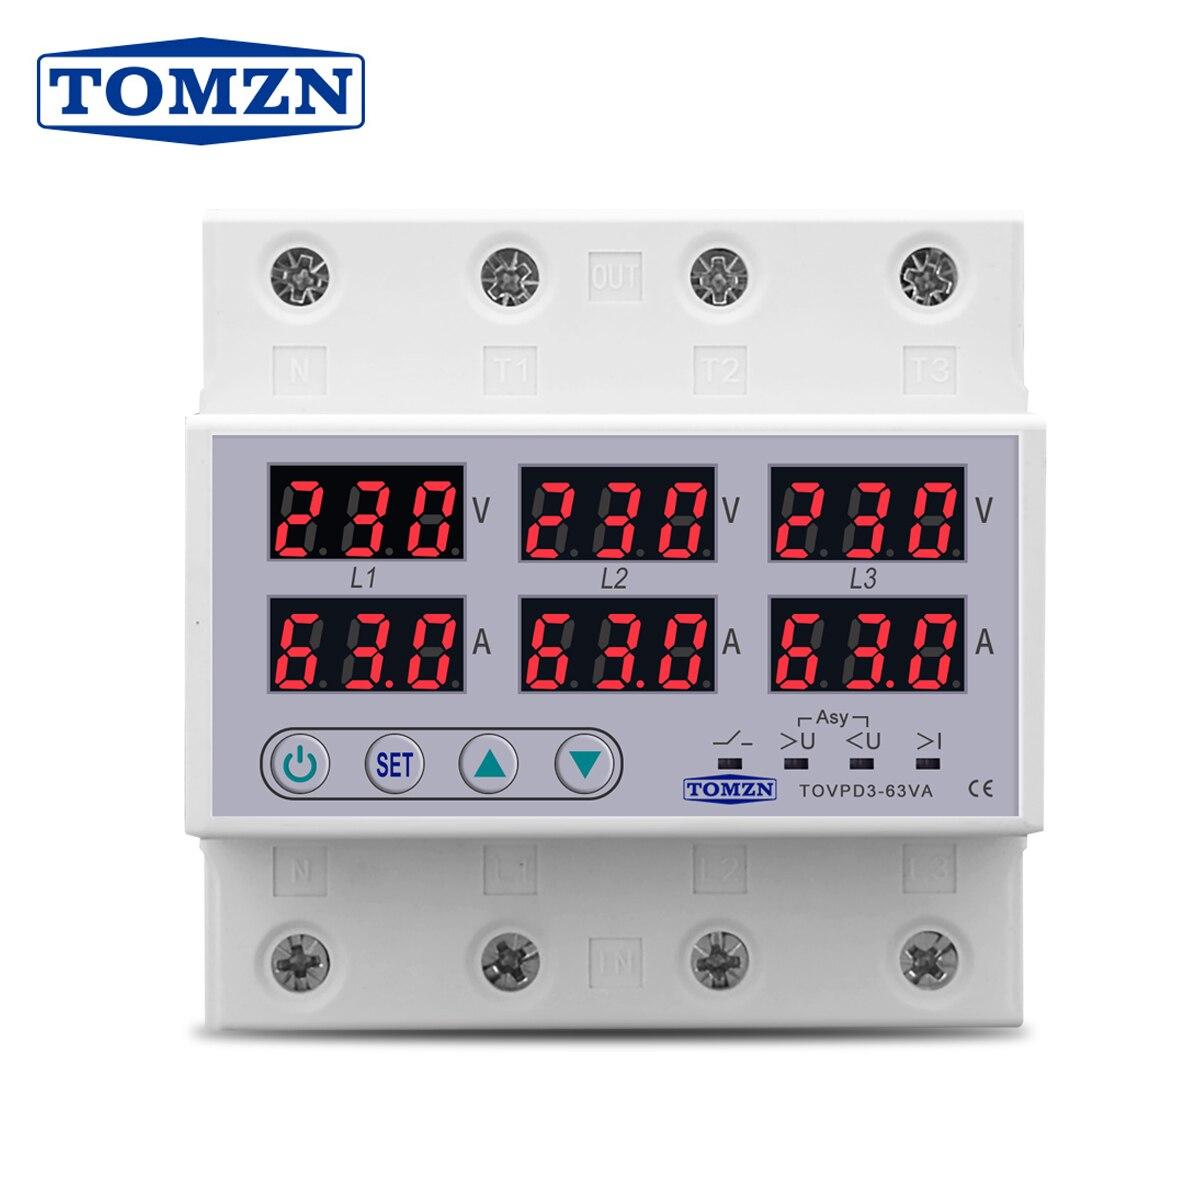 3 Phase 380V Din rail Voltmeter Ammeter adjustable Over and Under Voltage current limit protection Monitor Relays Protector